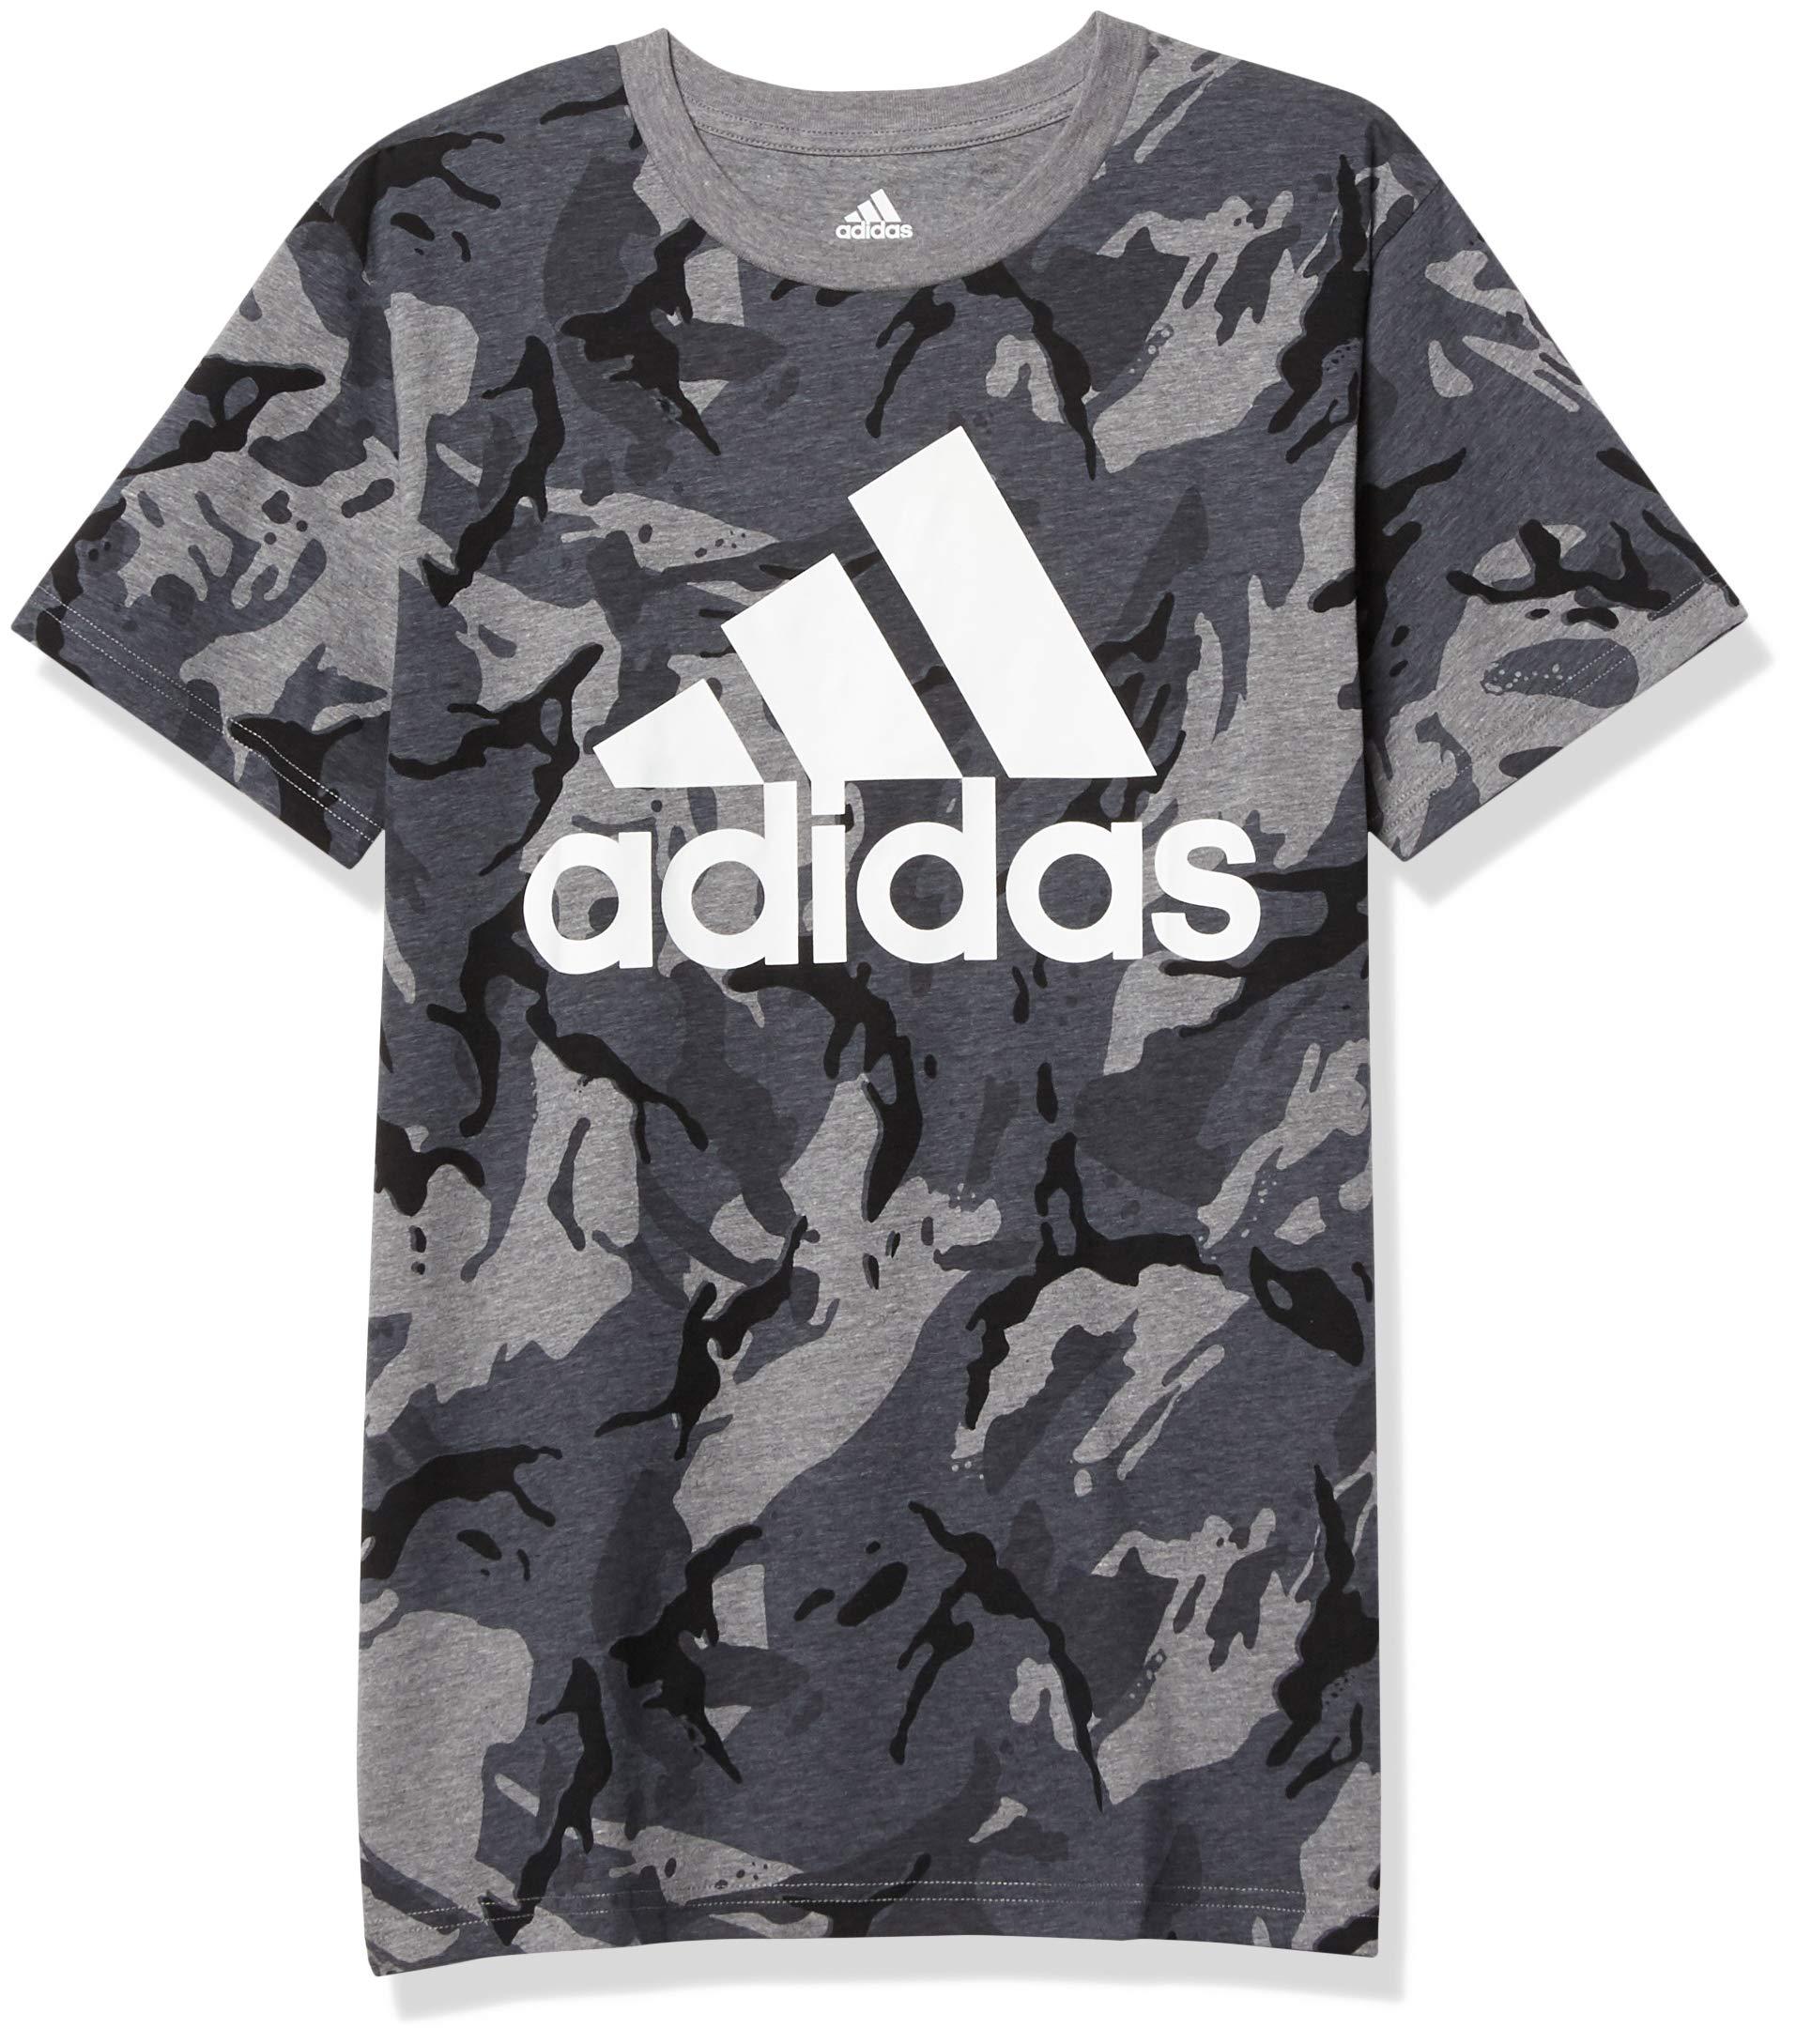 adidas Boys' Short Sleeve Cotton Jersey Logo T-Shirt Tee- Buy ...